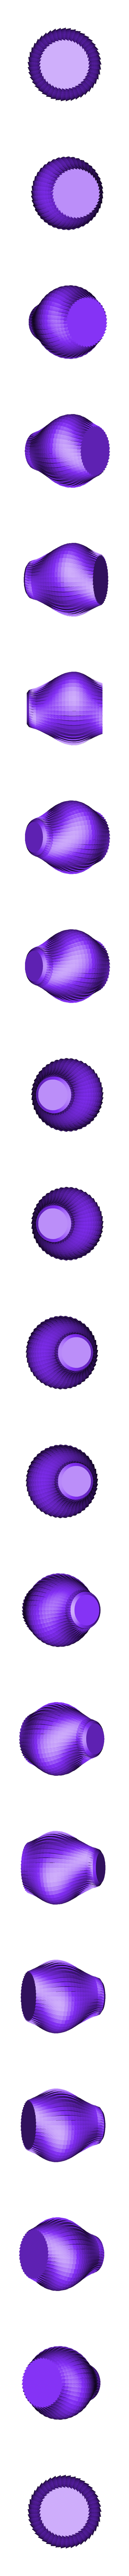 BuzzsawVase2.stl Download free STL file Buzzsaw Vases • Model to 3D print, Revalia6D